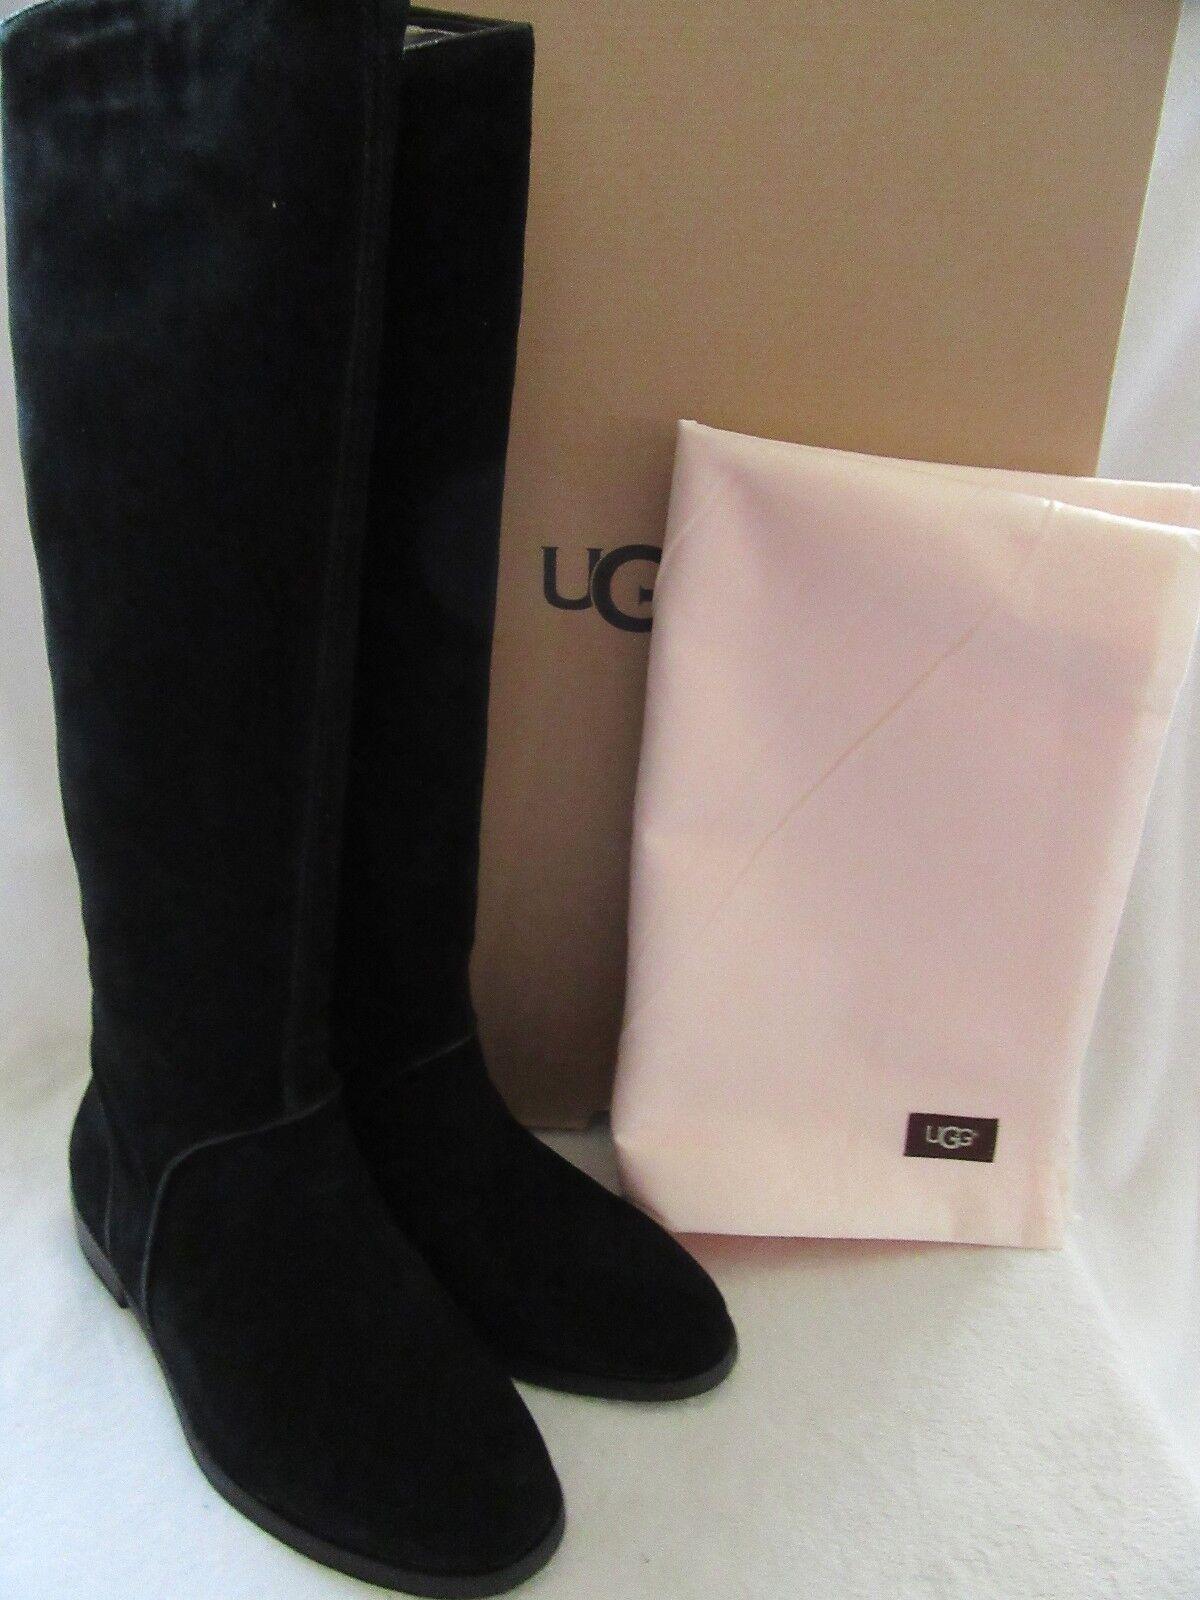 UGG Australia 1017344 bottes en daim en cuir noir Gracen US 8.5 EUR 39.5 NWB